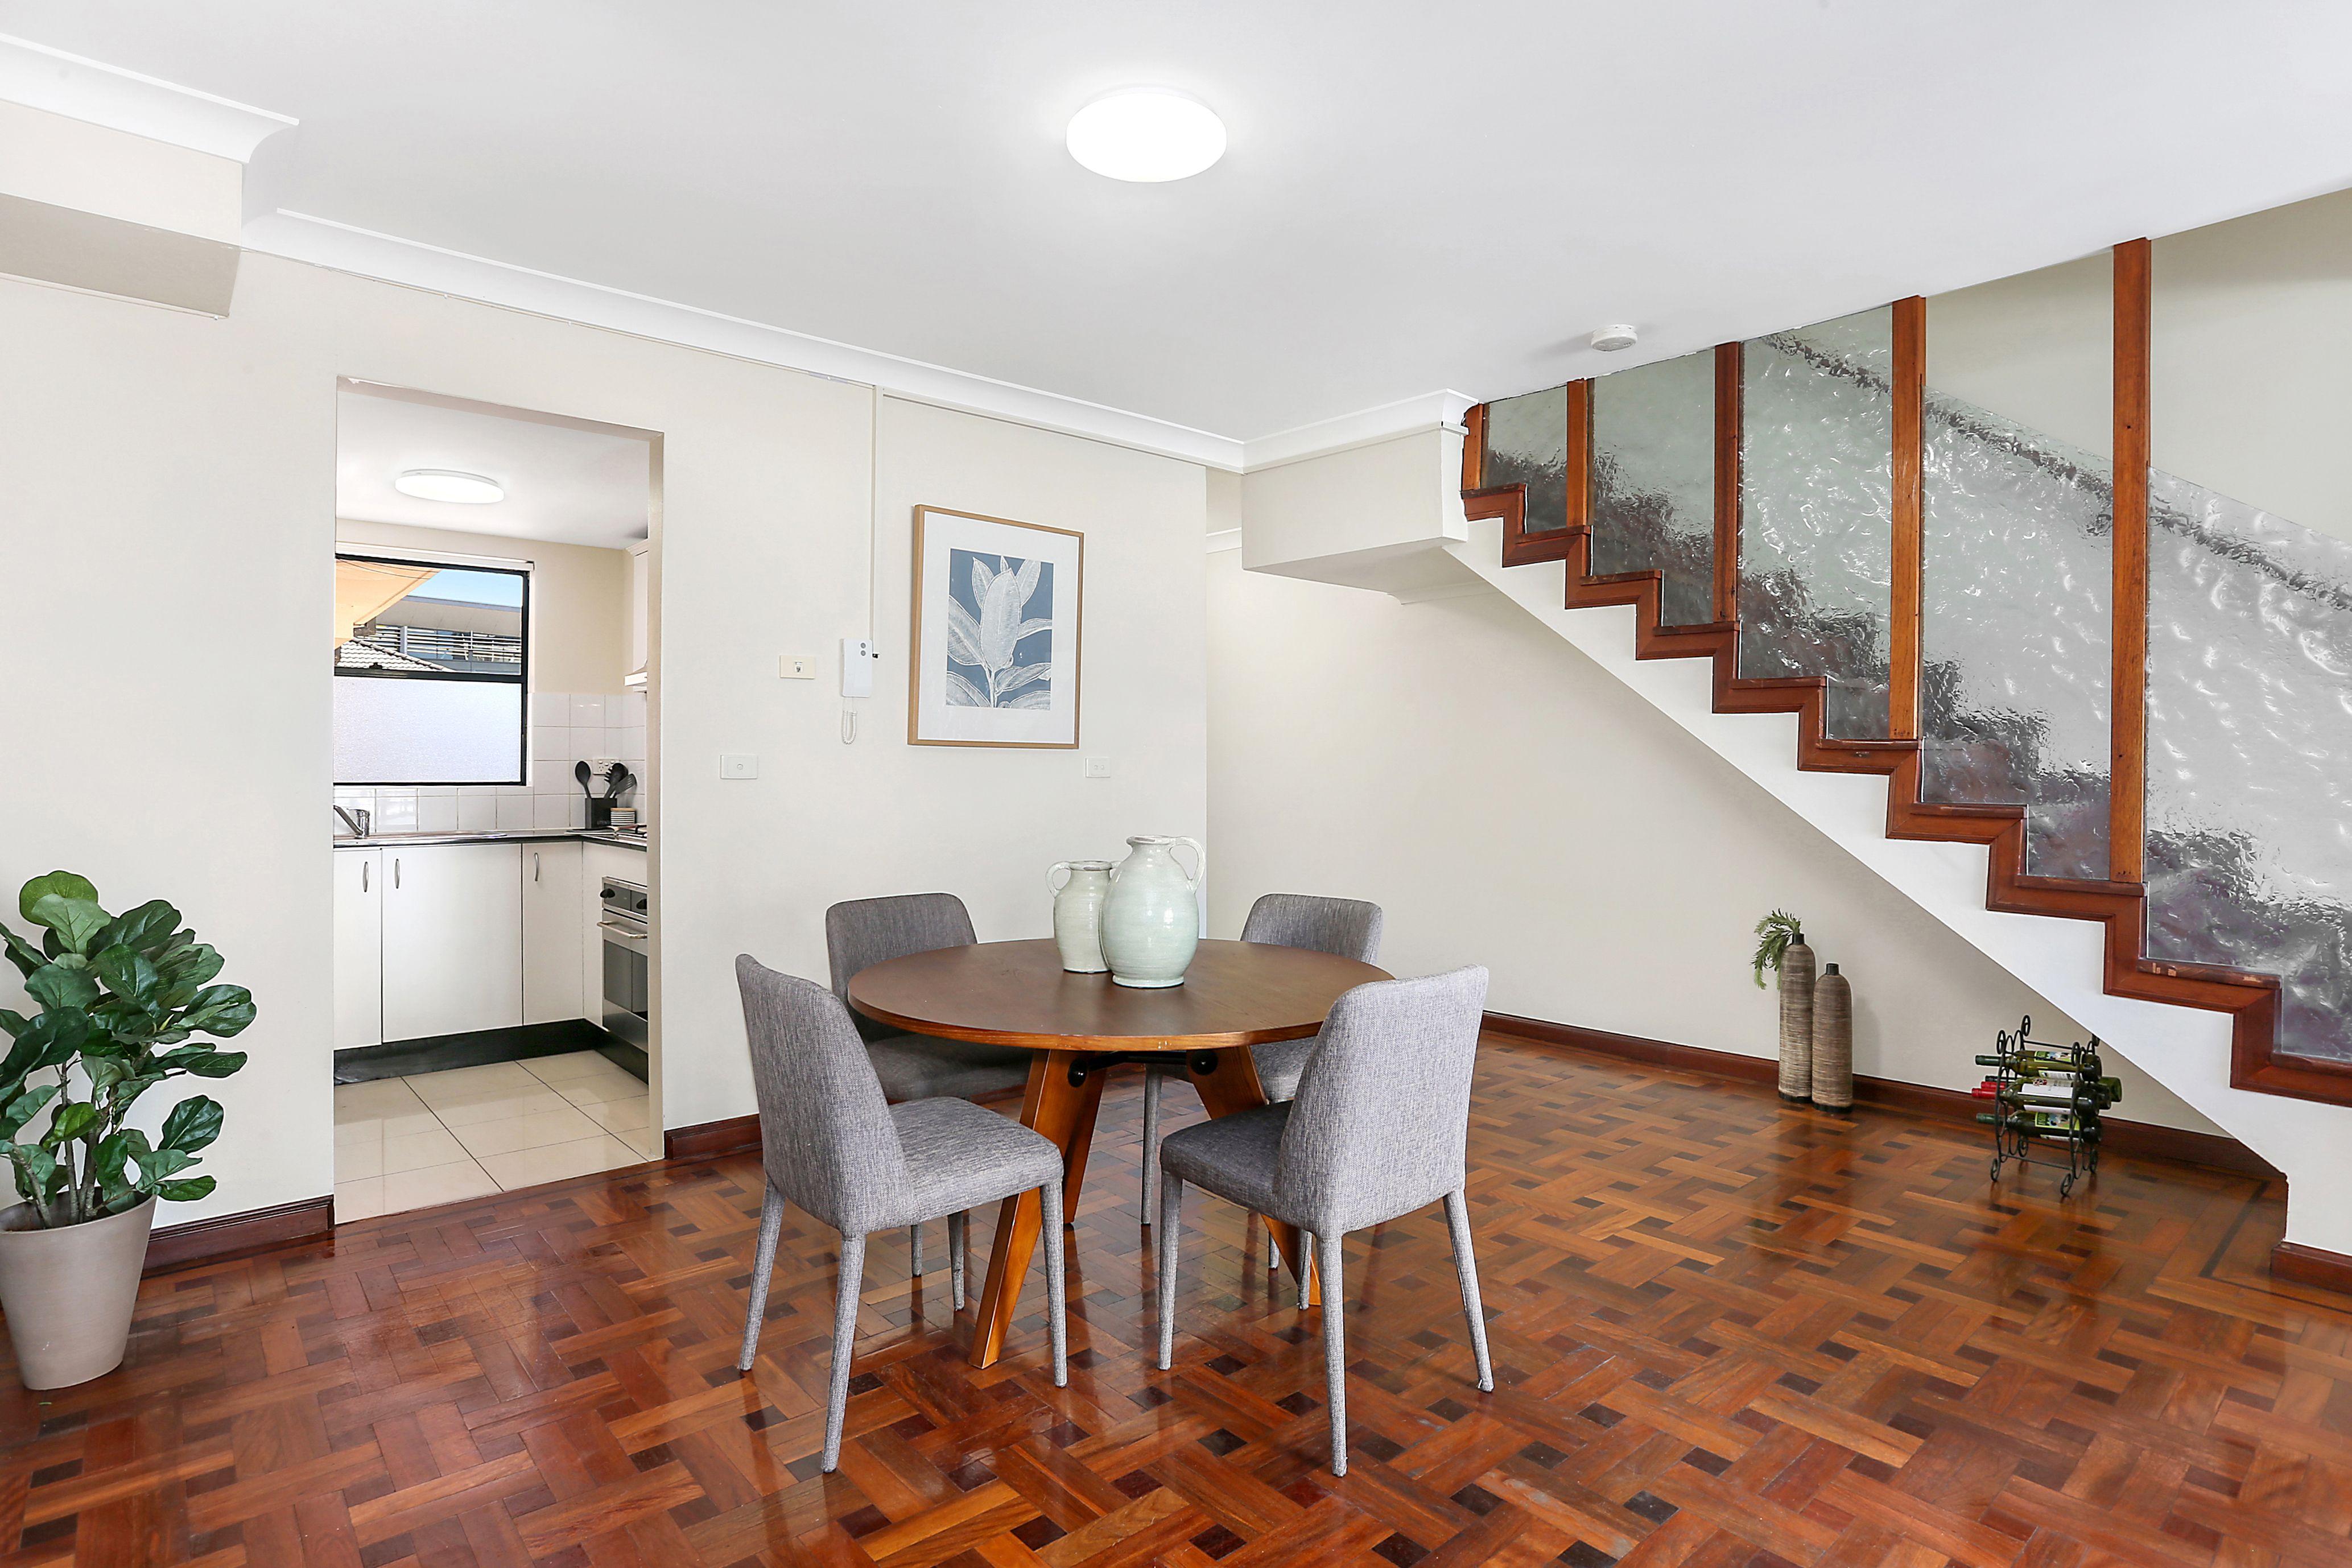 14/45-47 The Boulevarde, Strathfield NSW 2135